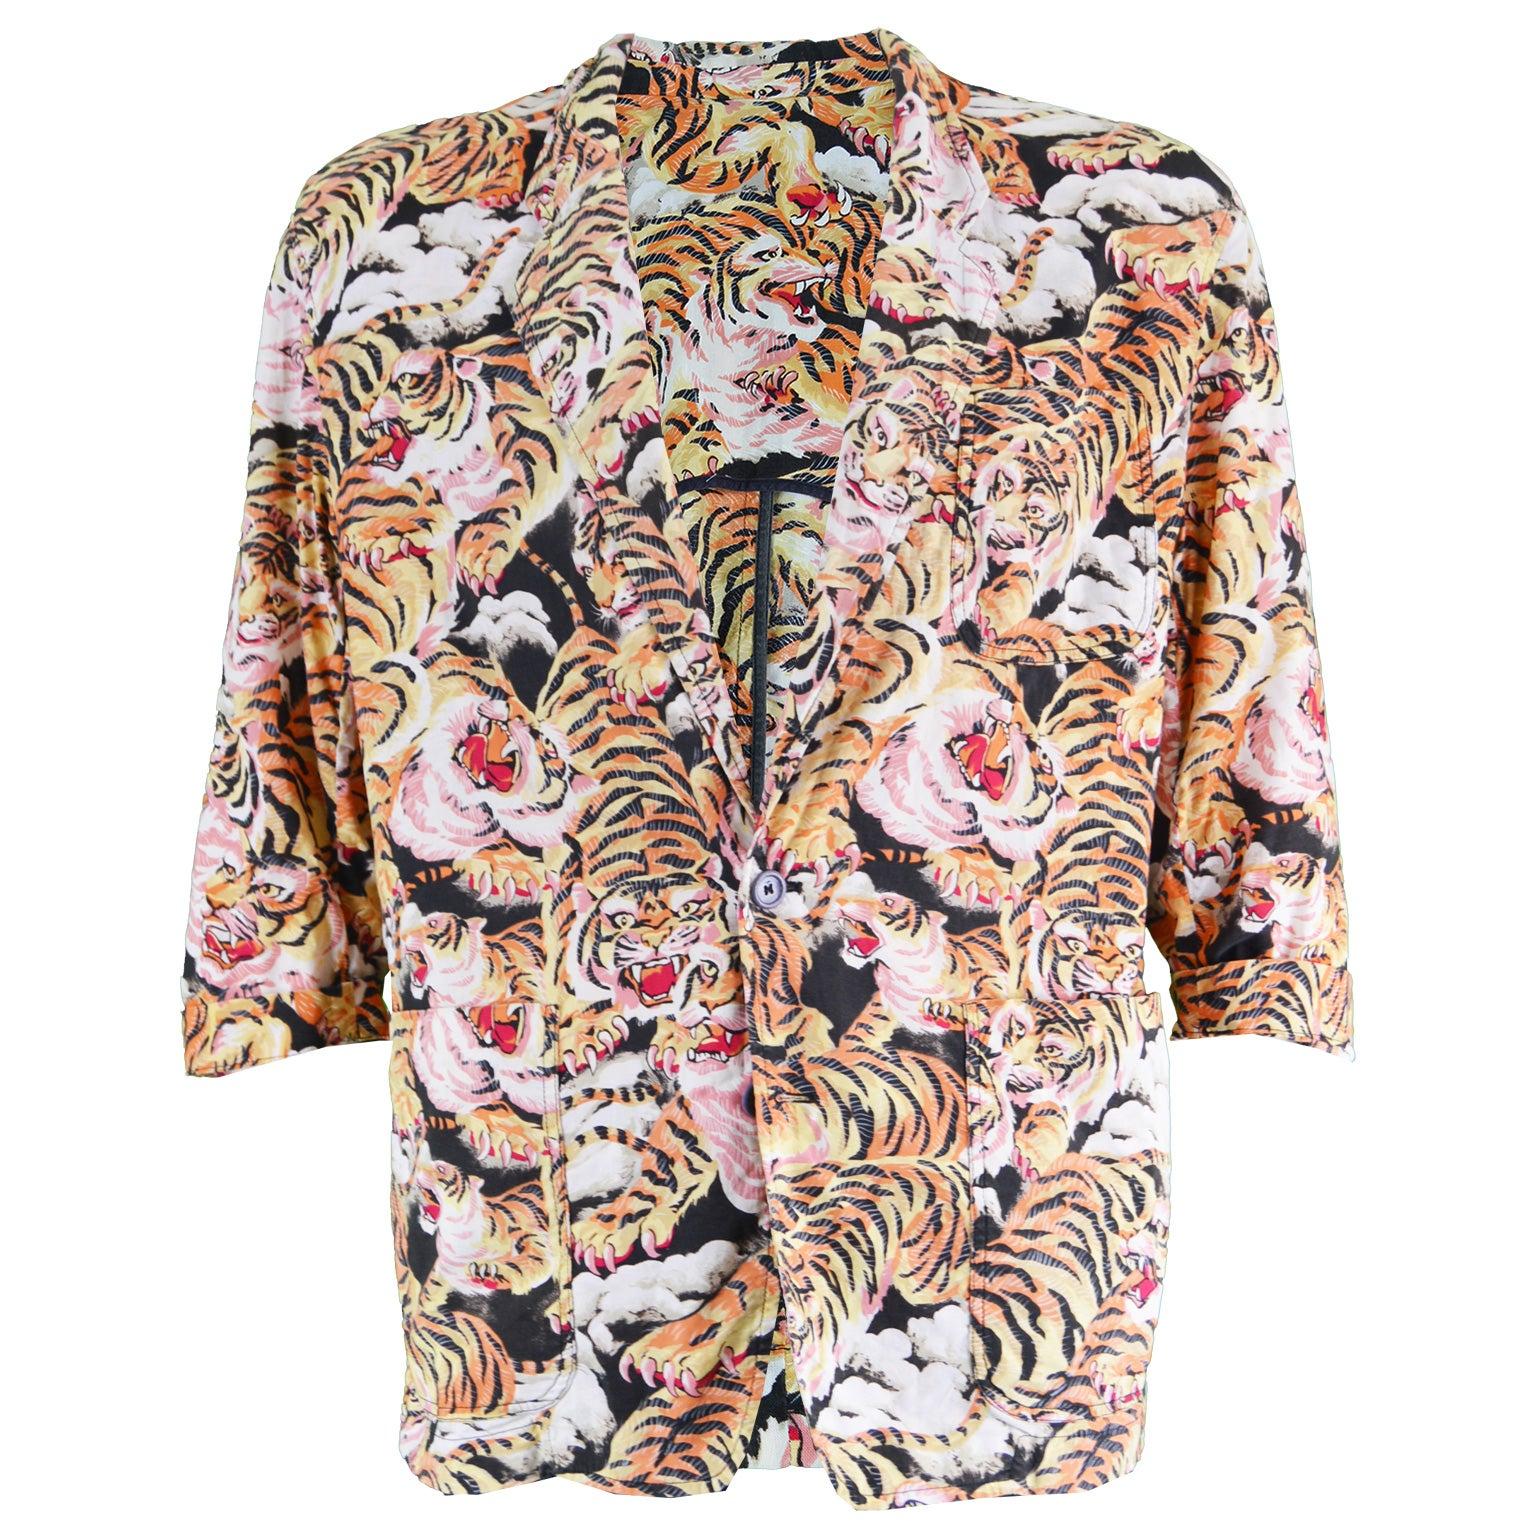 ee7542ff Kenzo Men's Vintage Iconic Flying Tiger Print Cotton Blazer Jacket, 1980s  For Sale at 1stdibs